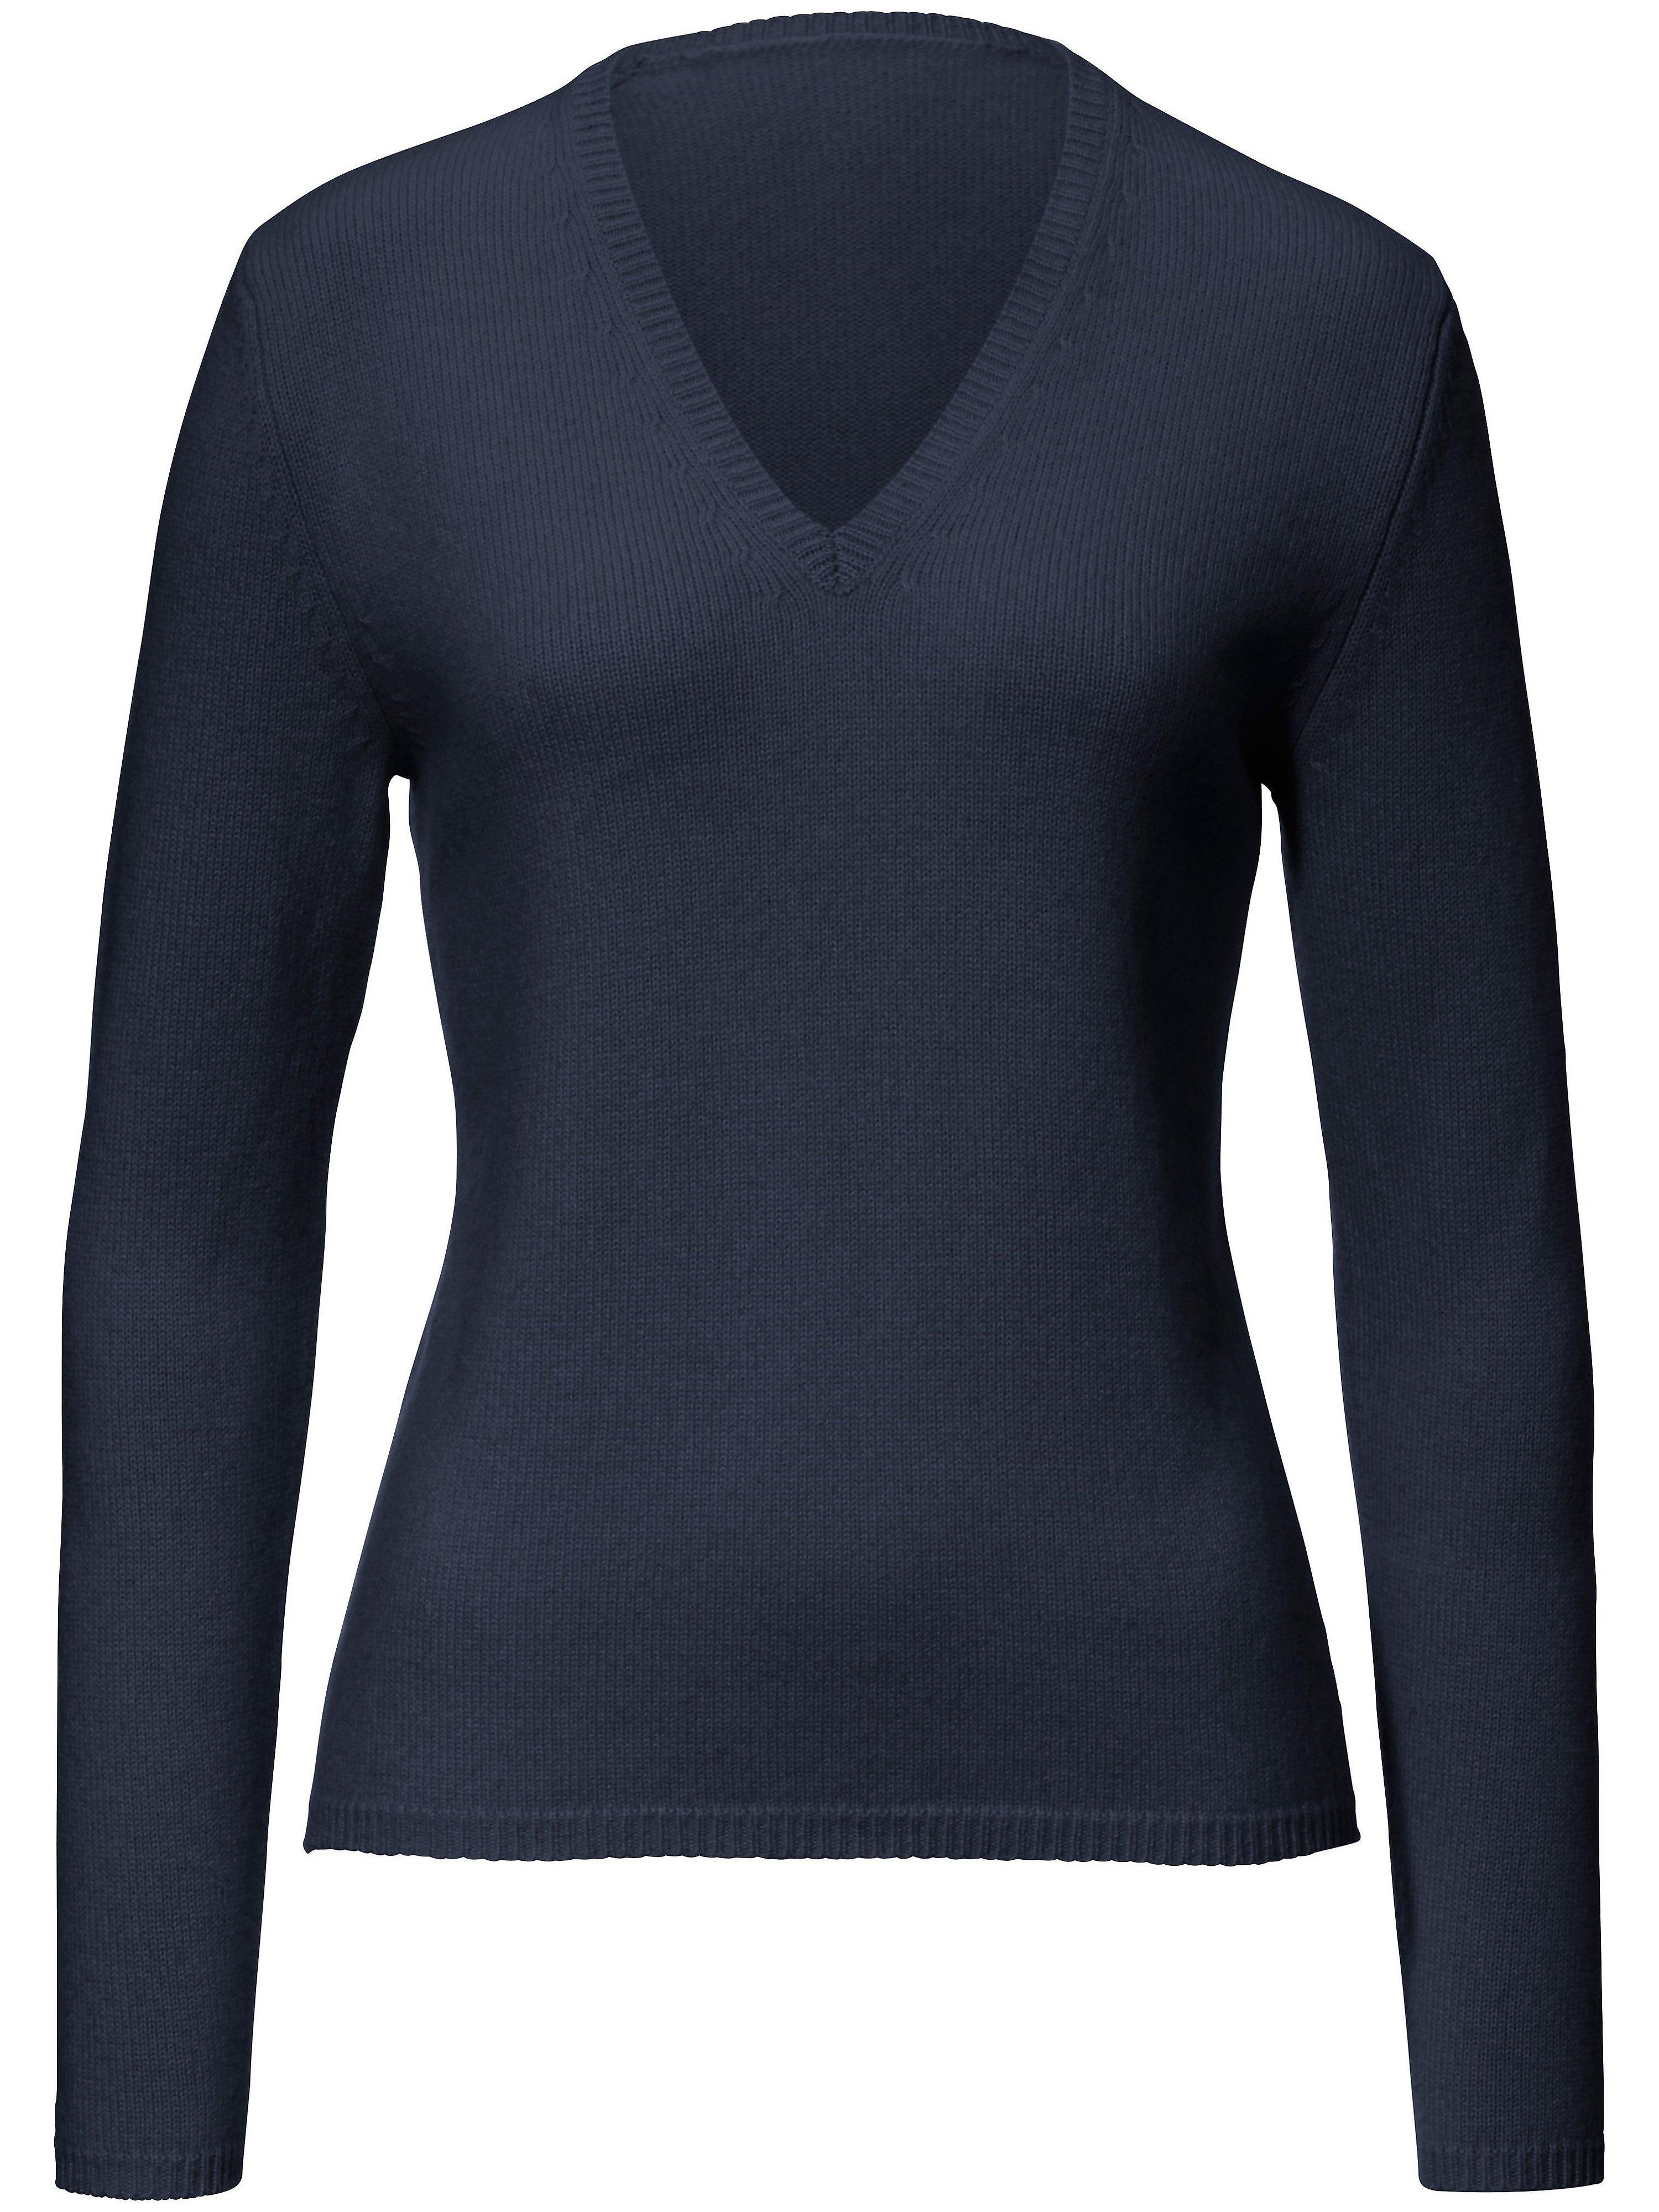 V-Pullover aus 100% Premium-Kaschmir Peter Hahn Cashmere blau | Bekleidung > Pullover > V-Pullover | Peter Hahn Cashmere